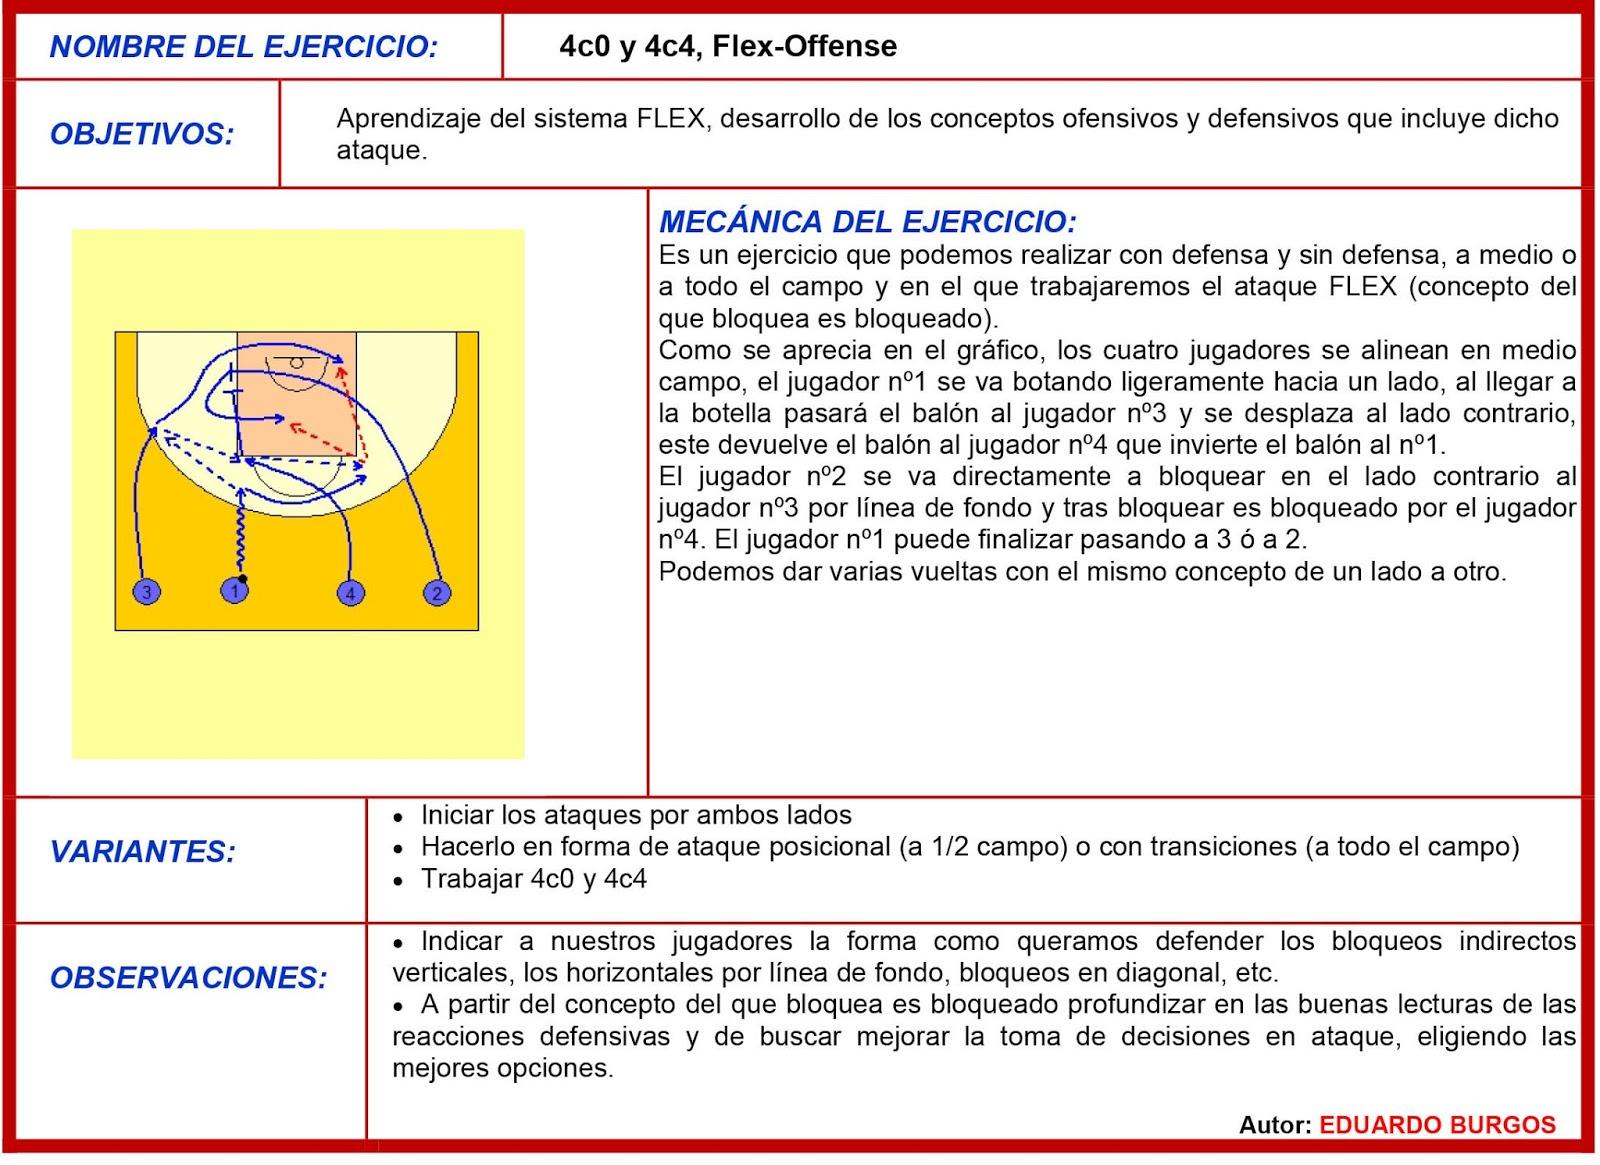 4C0 Y 4C4, FLEX-OFFENSE3